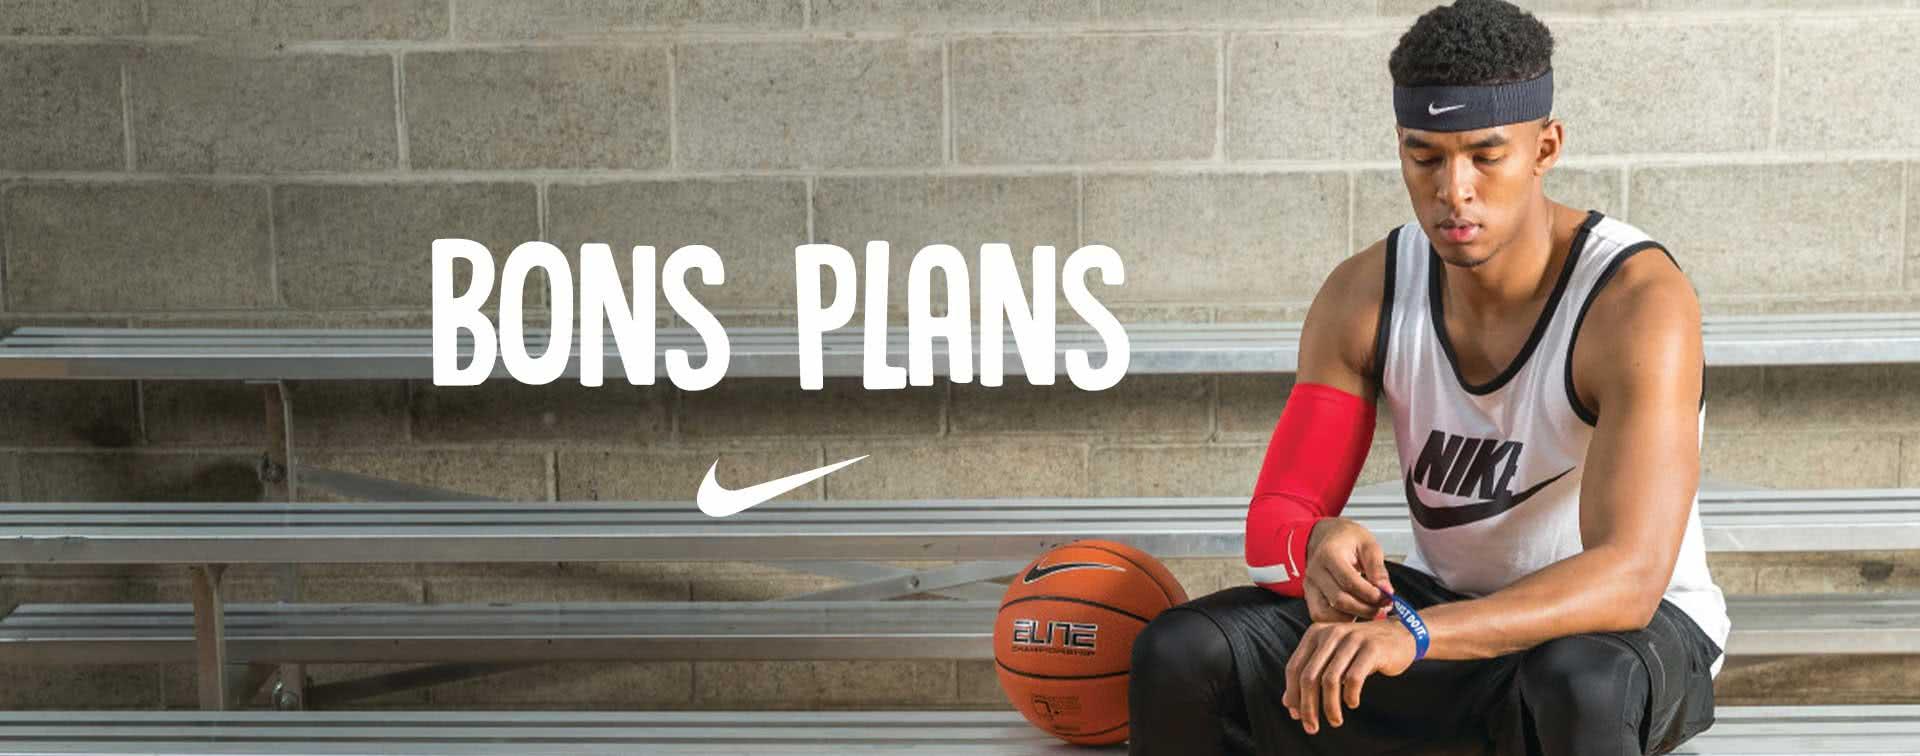 Bons plans Nike